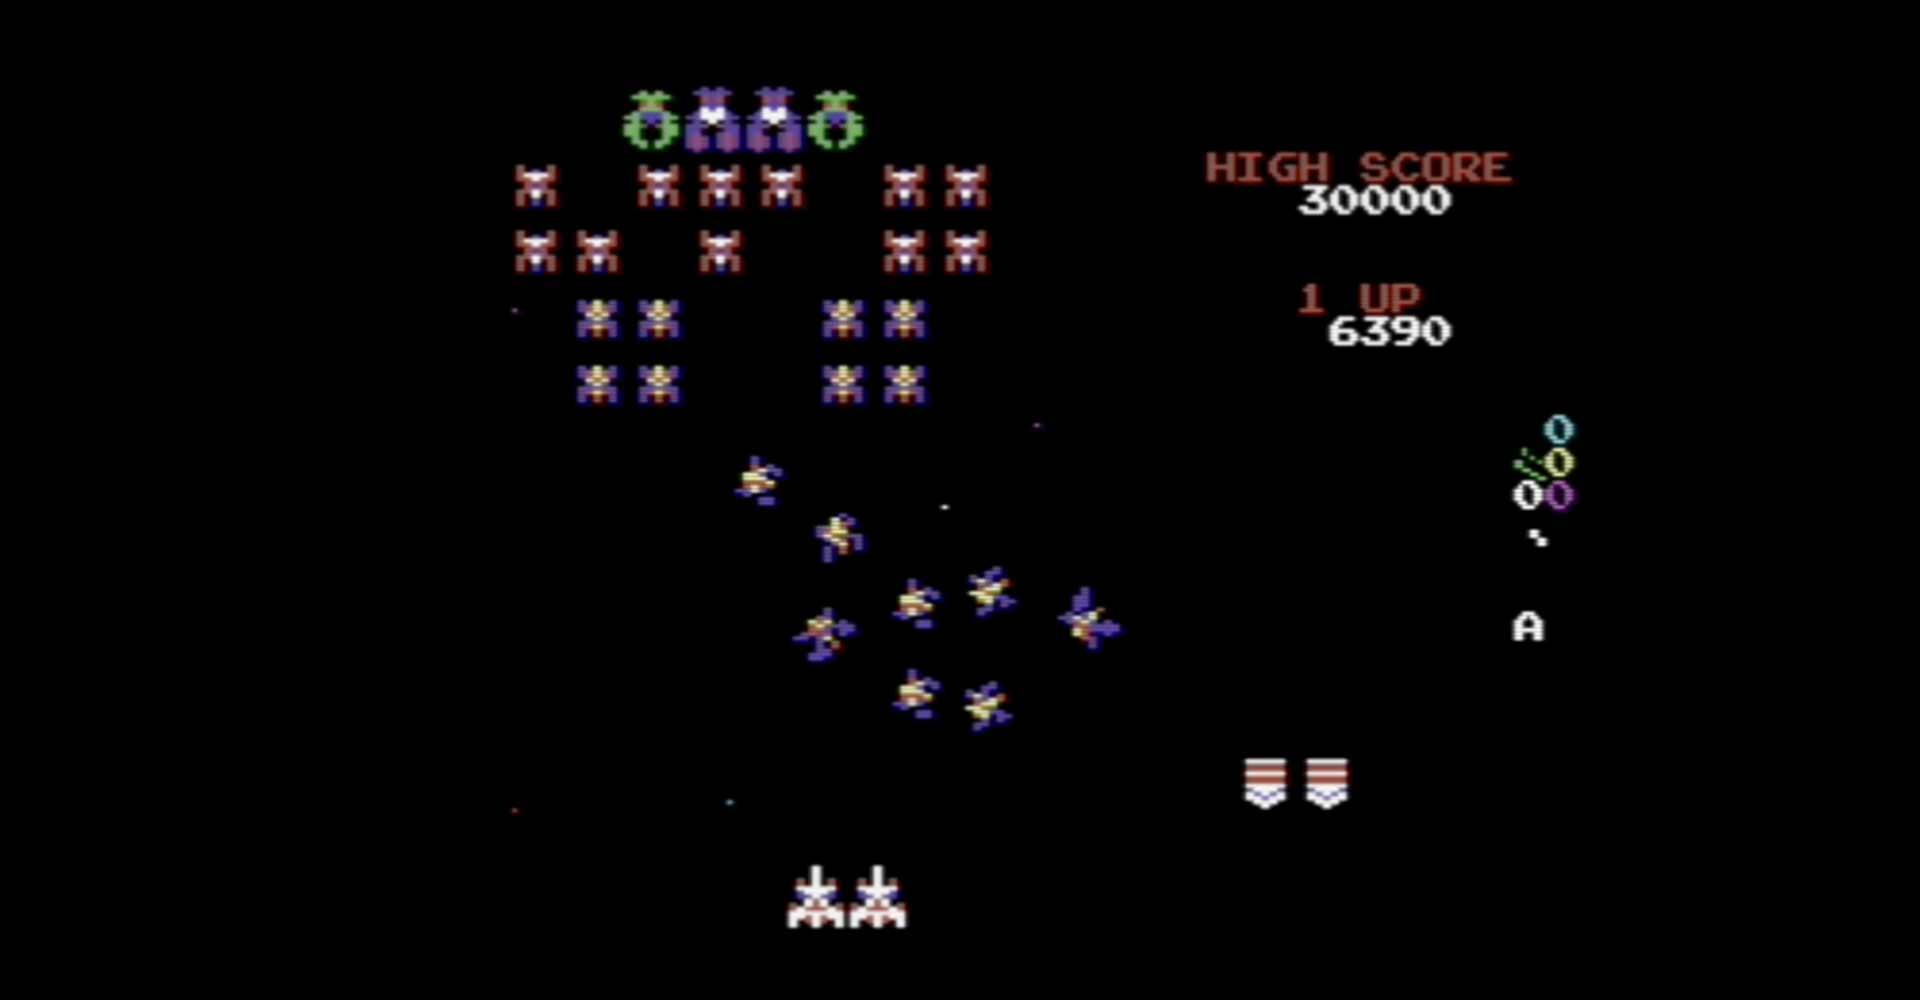 Galaga: Arcade-Klassiker auf dem C64